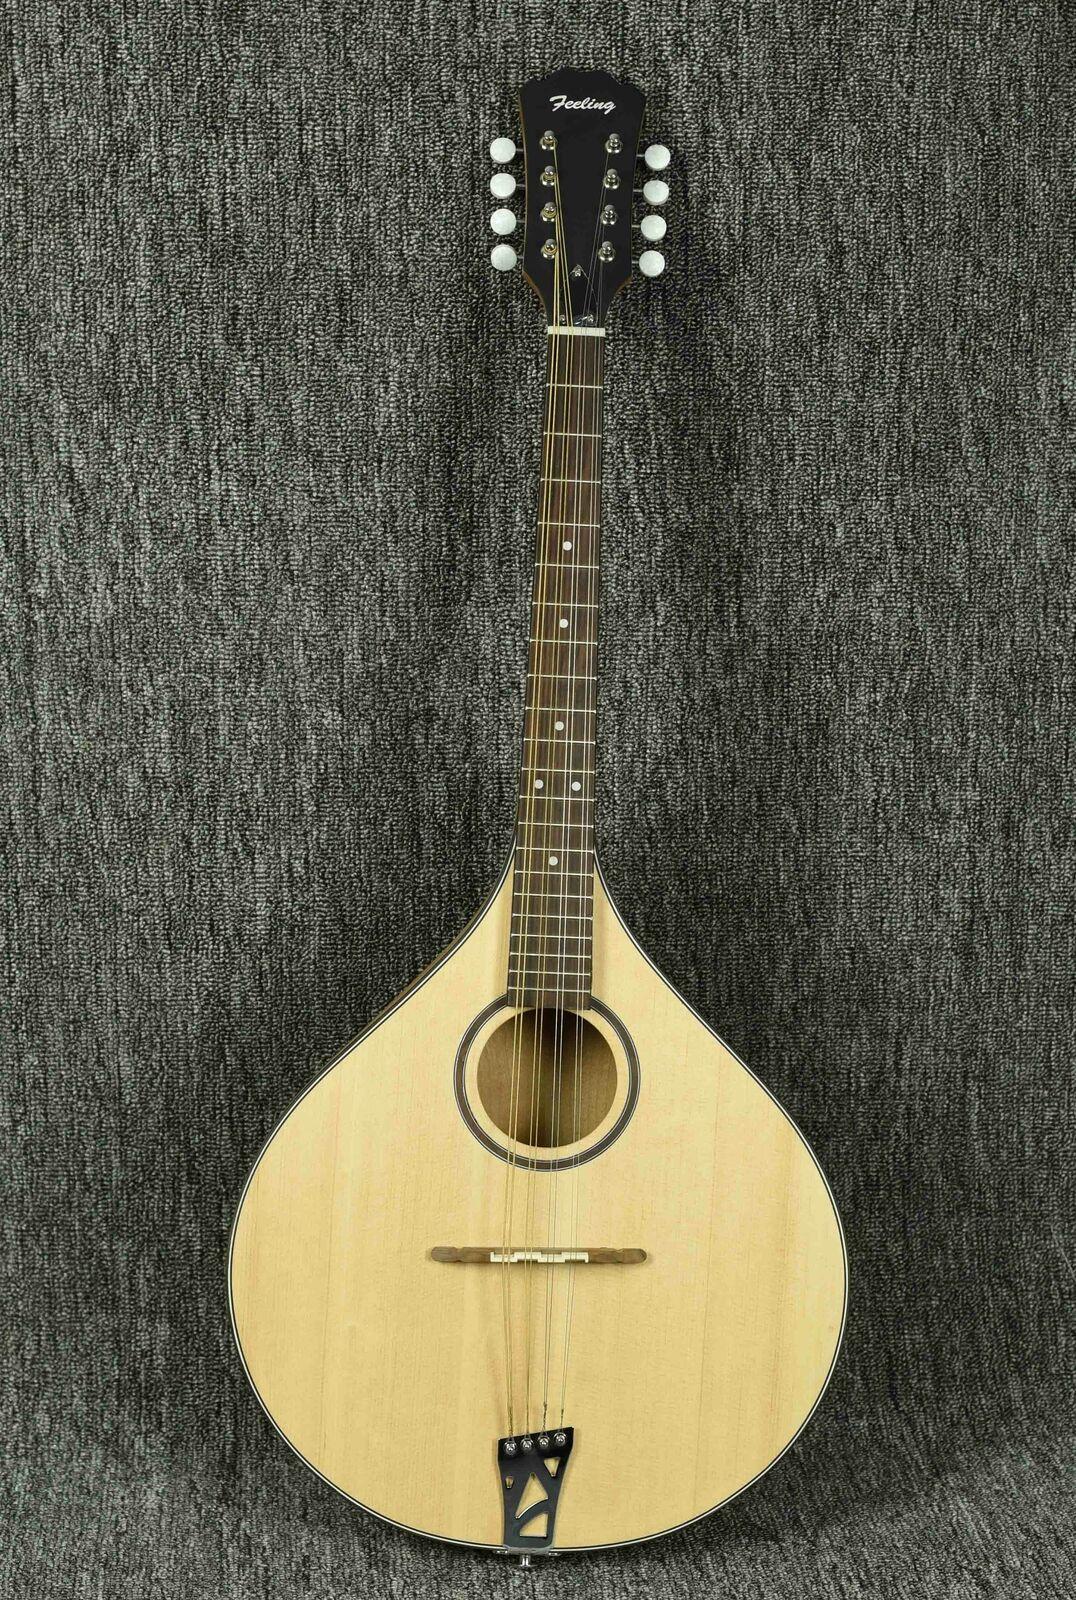 Feeling handgemacht bousouki, mandola, solid spruce top,OEM,3,Free shipping